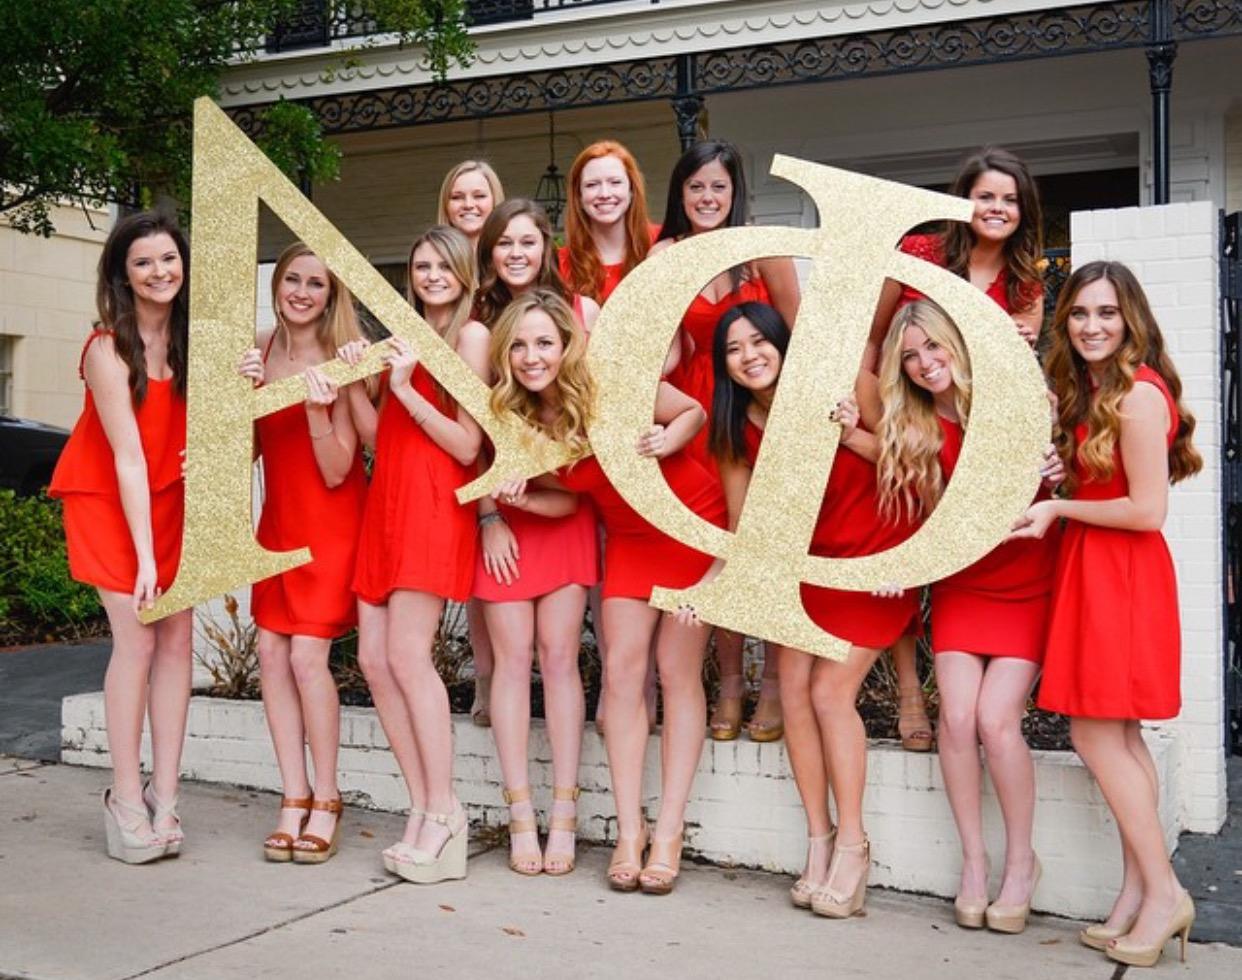 31ebf3d3793 2015 Texas Alpha Phi Executive Board. Our eighth annual Red Dress Gala ...